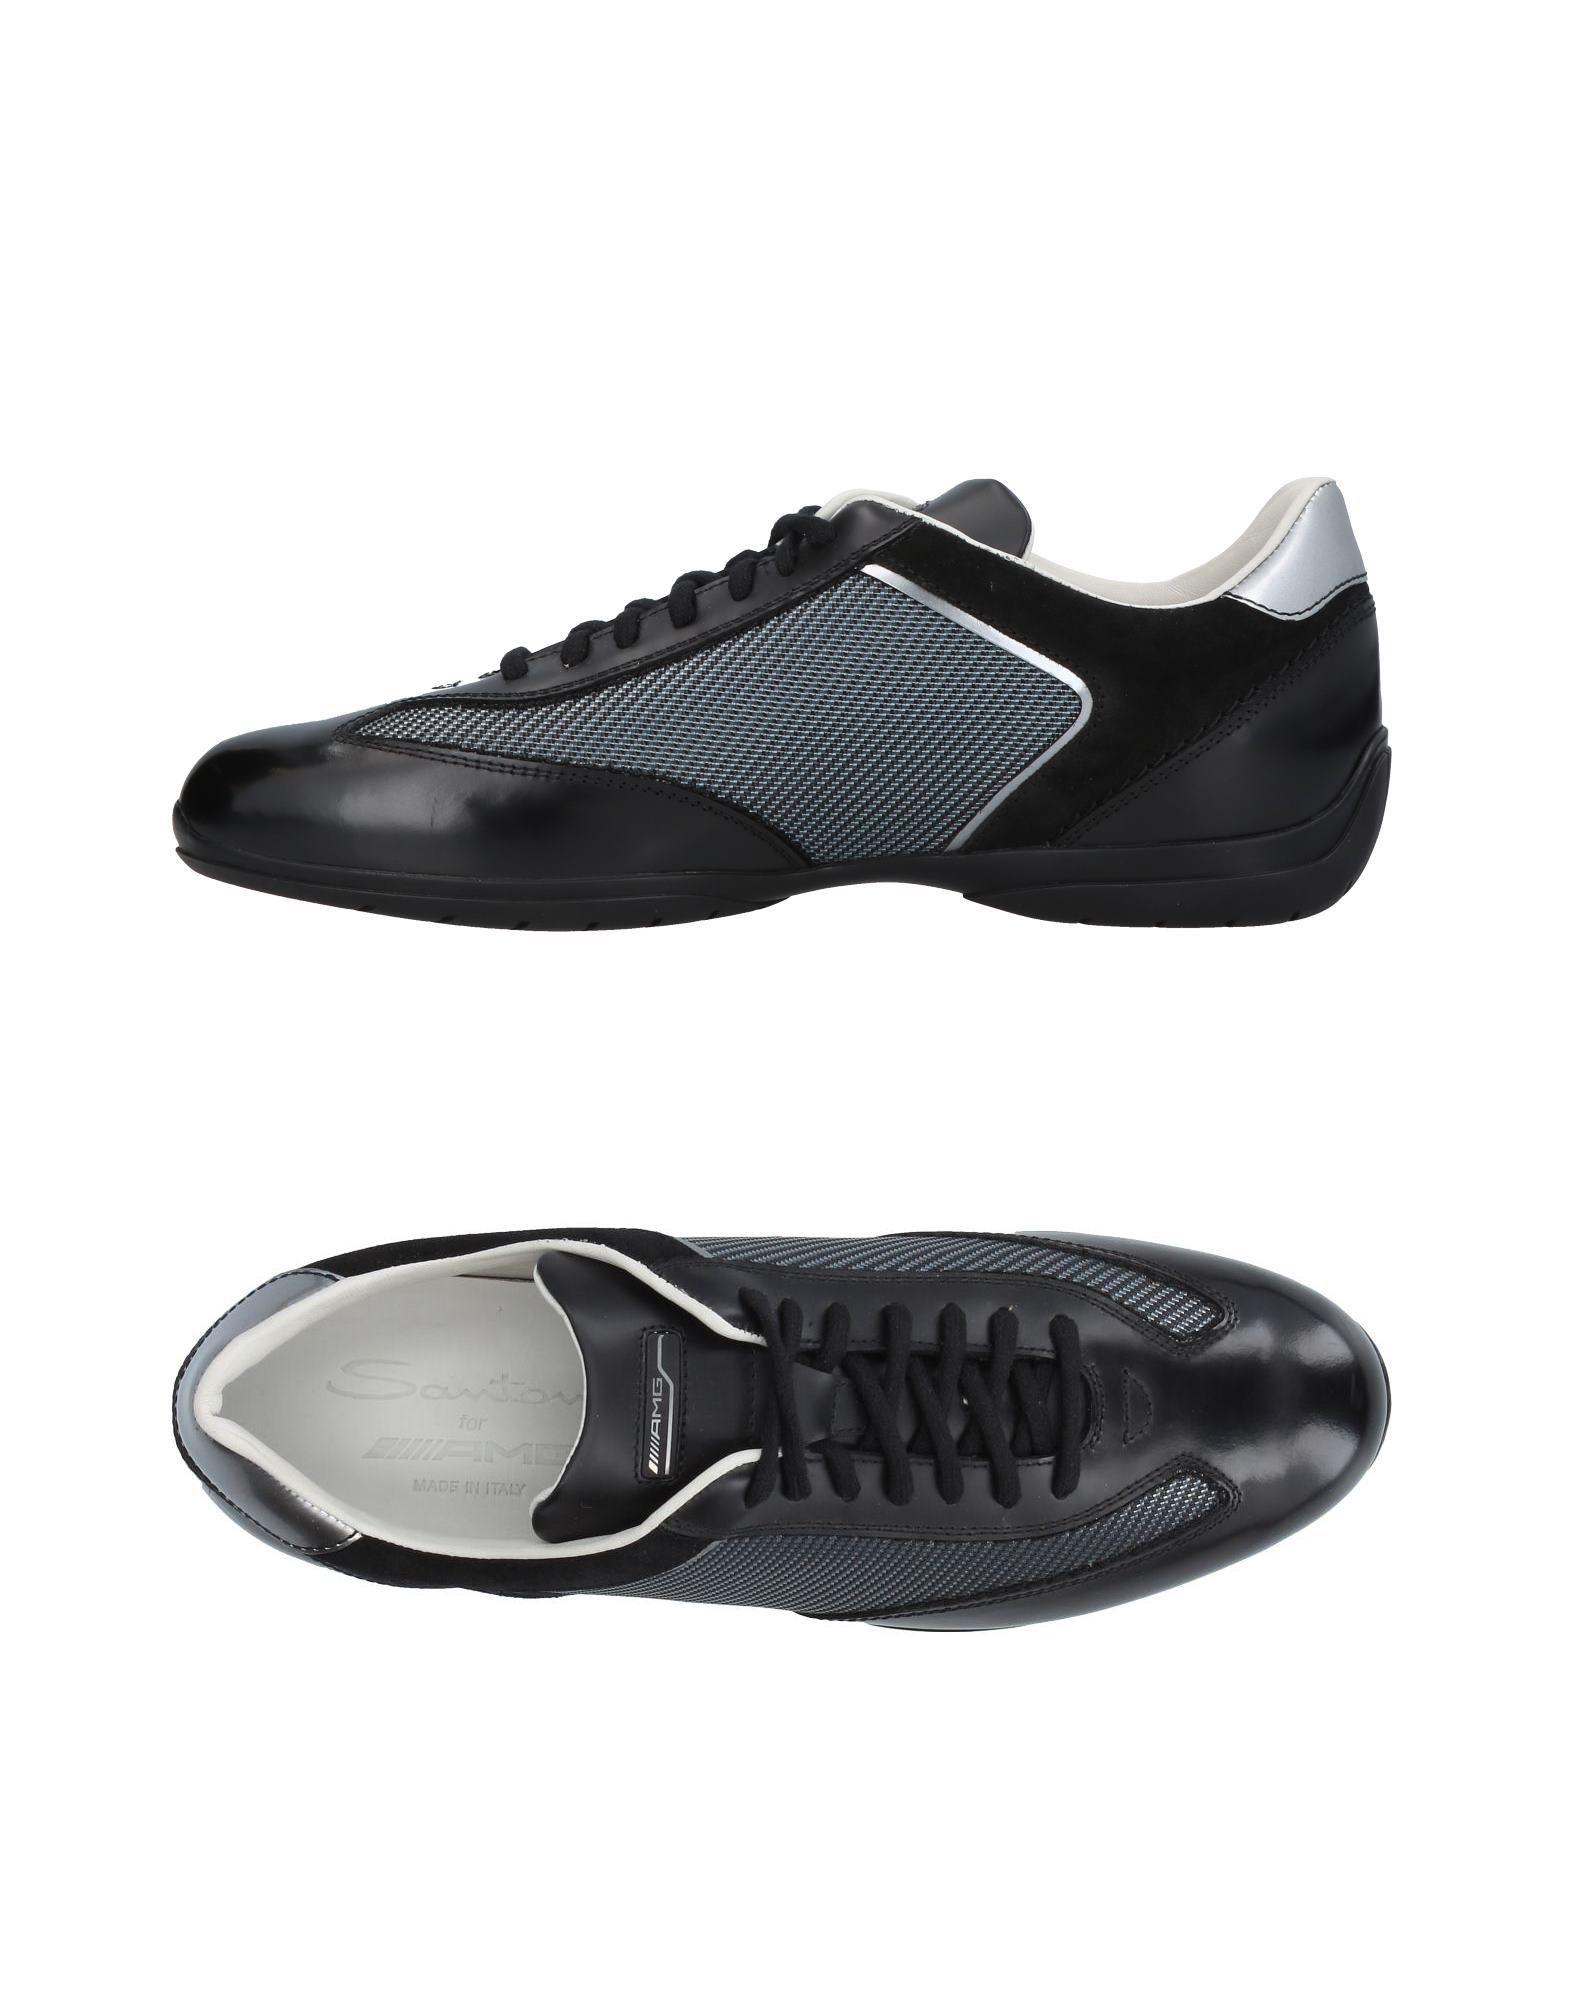 Santoni Sneakers Herren  11410251AE Gute Qualität beliebte Schuhe